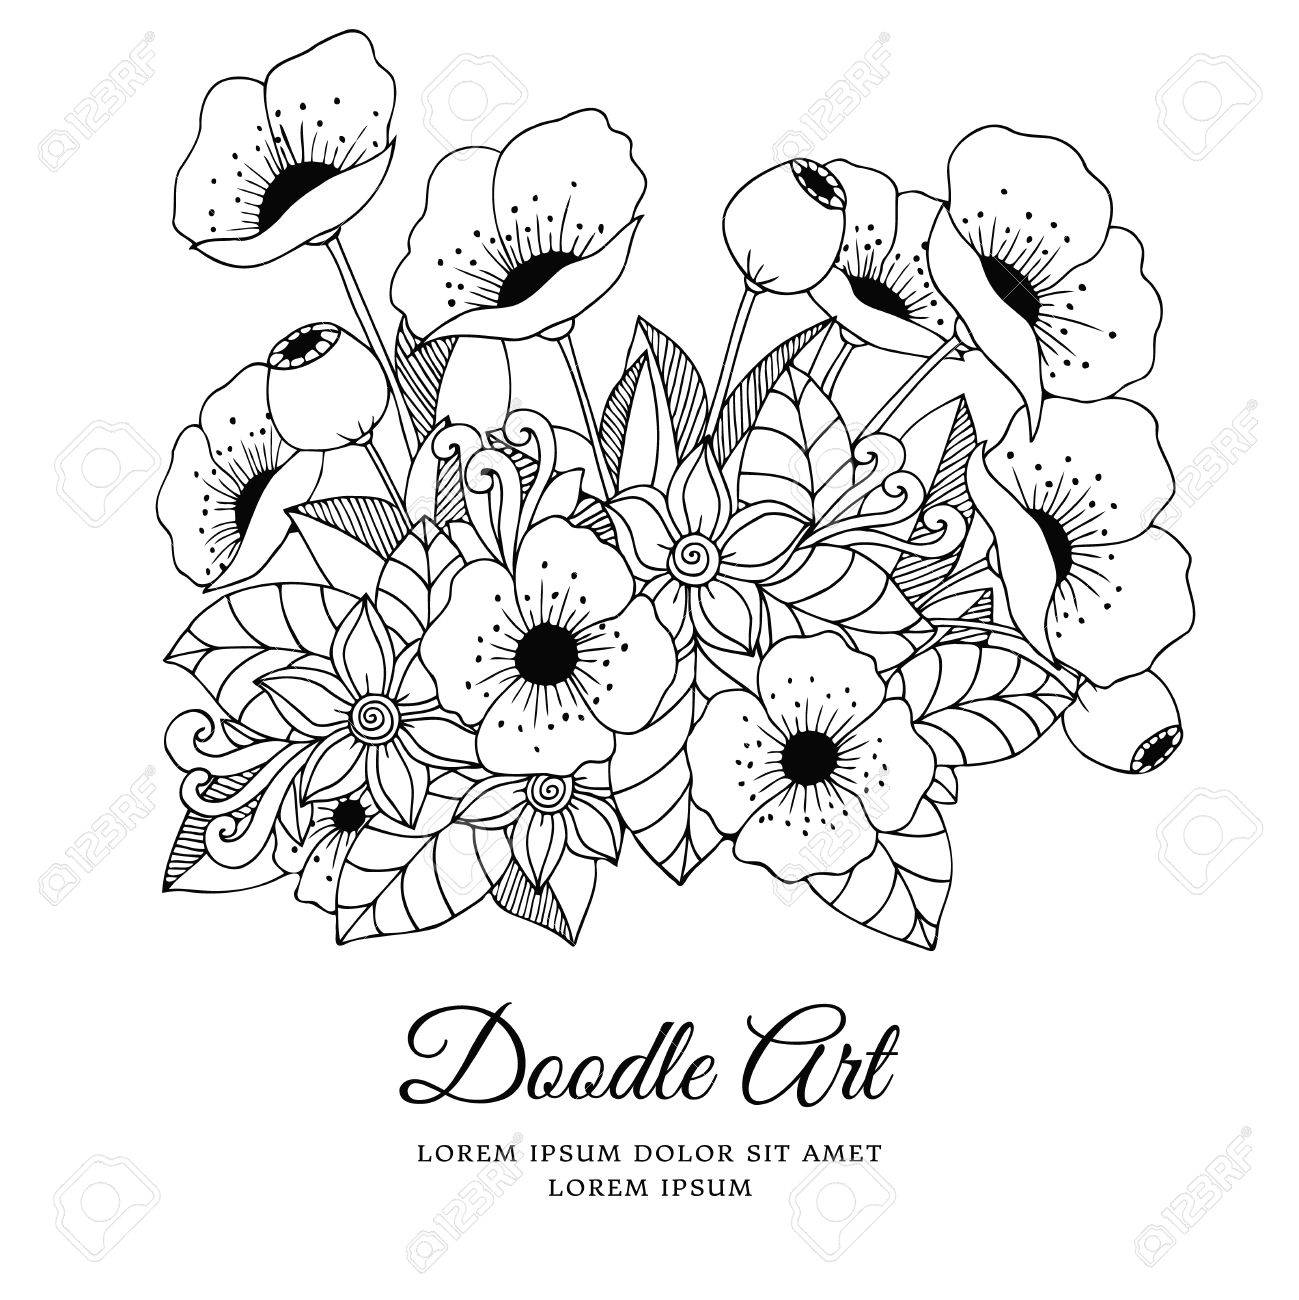 Ilustración Vectorial Zentangl Flores Amapolas. Dibujo A Mano Libro ...